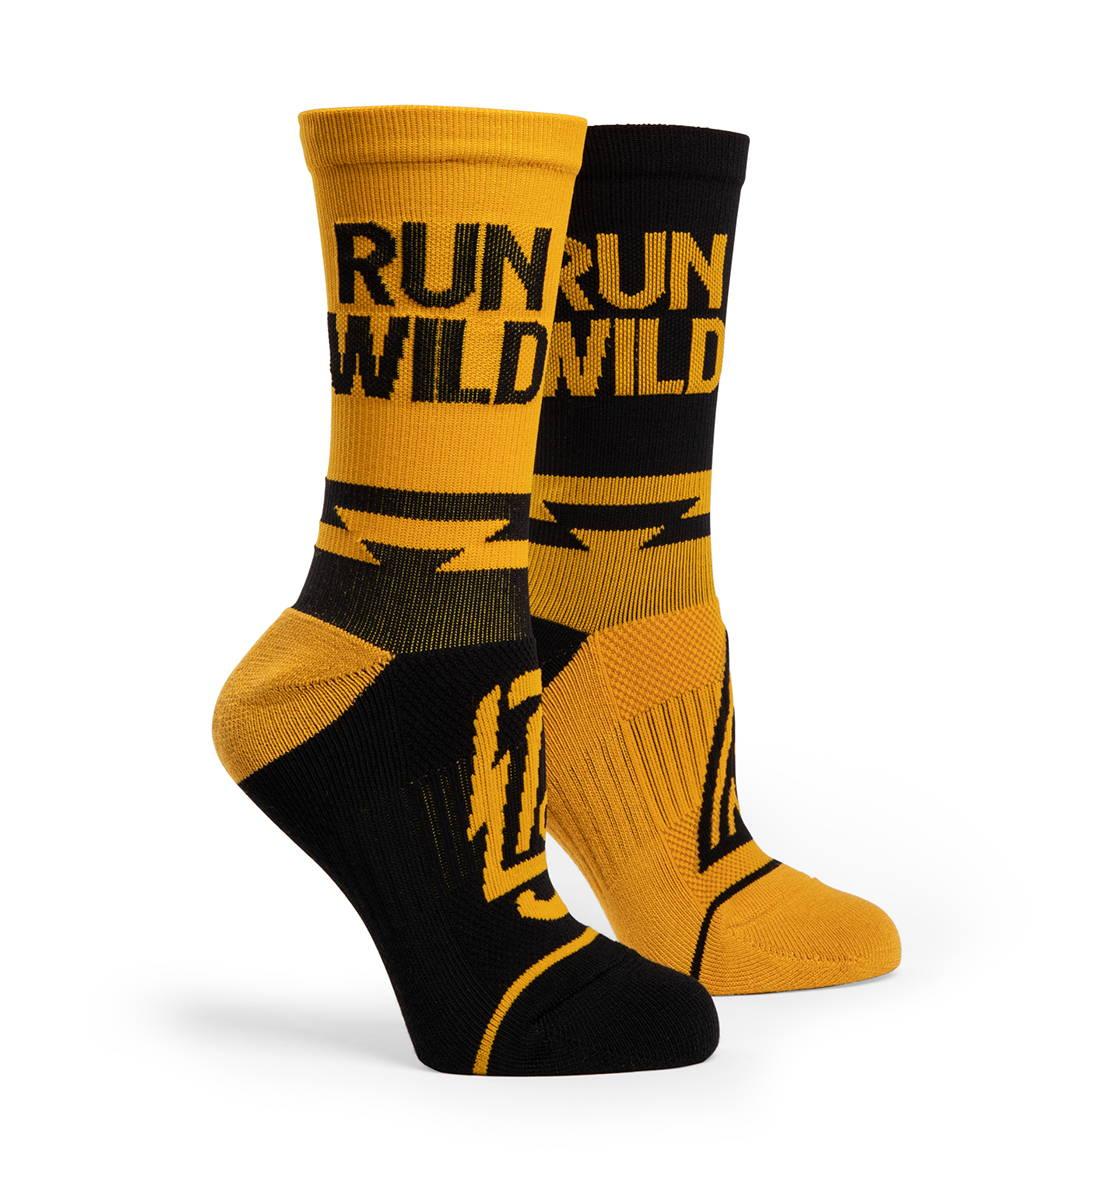 Run Wild Socks - The Great PNW X Lincoln Design Co.